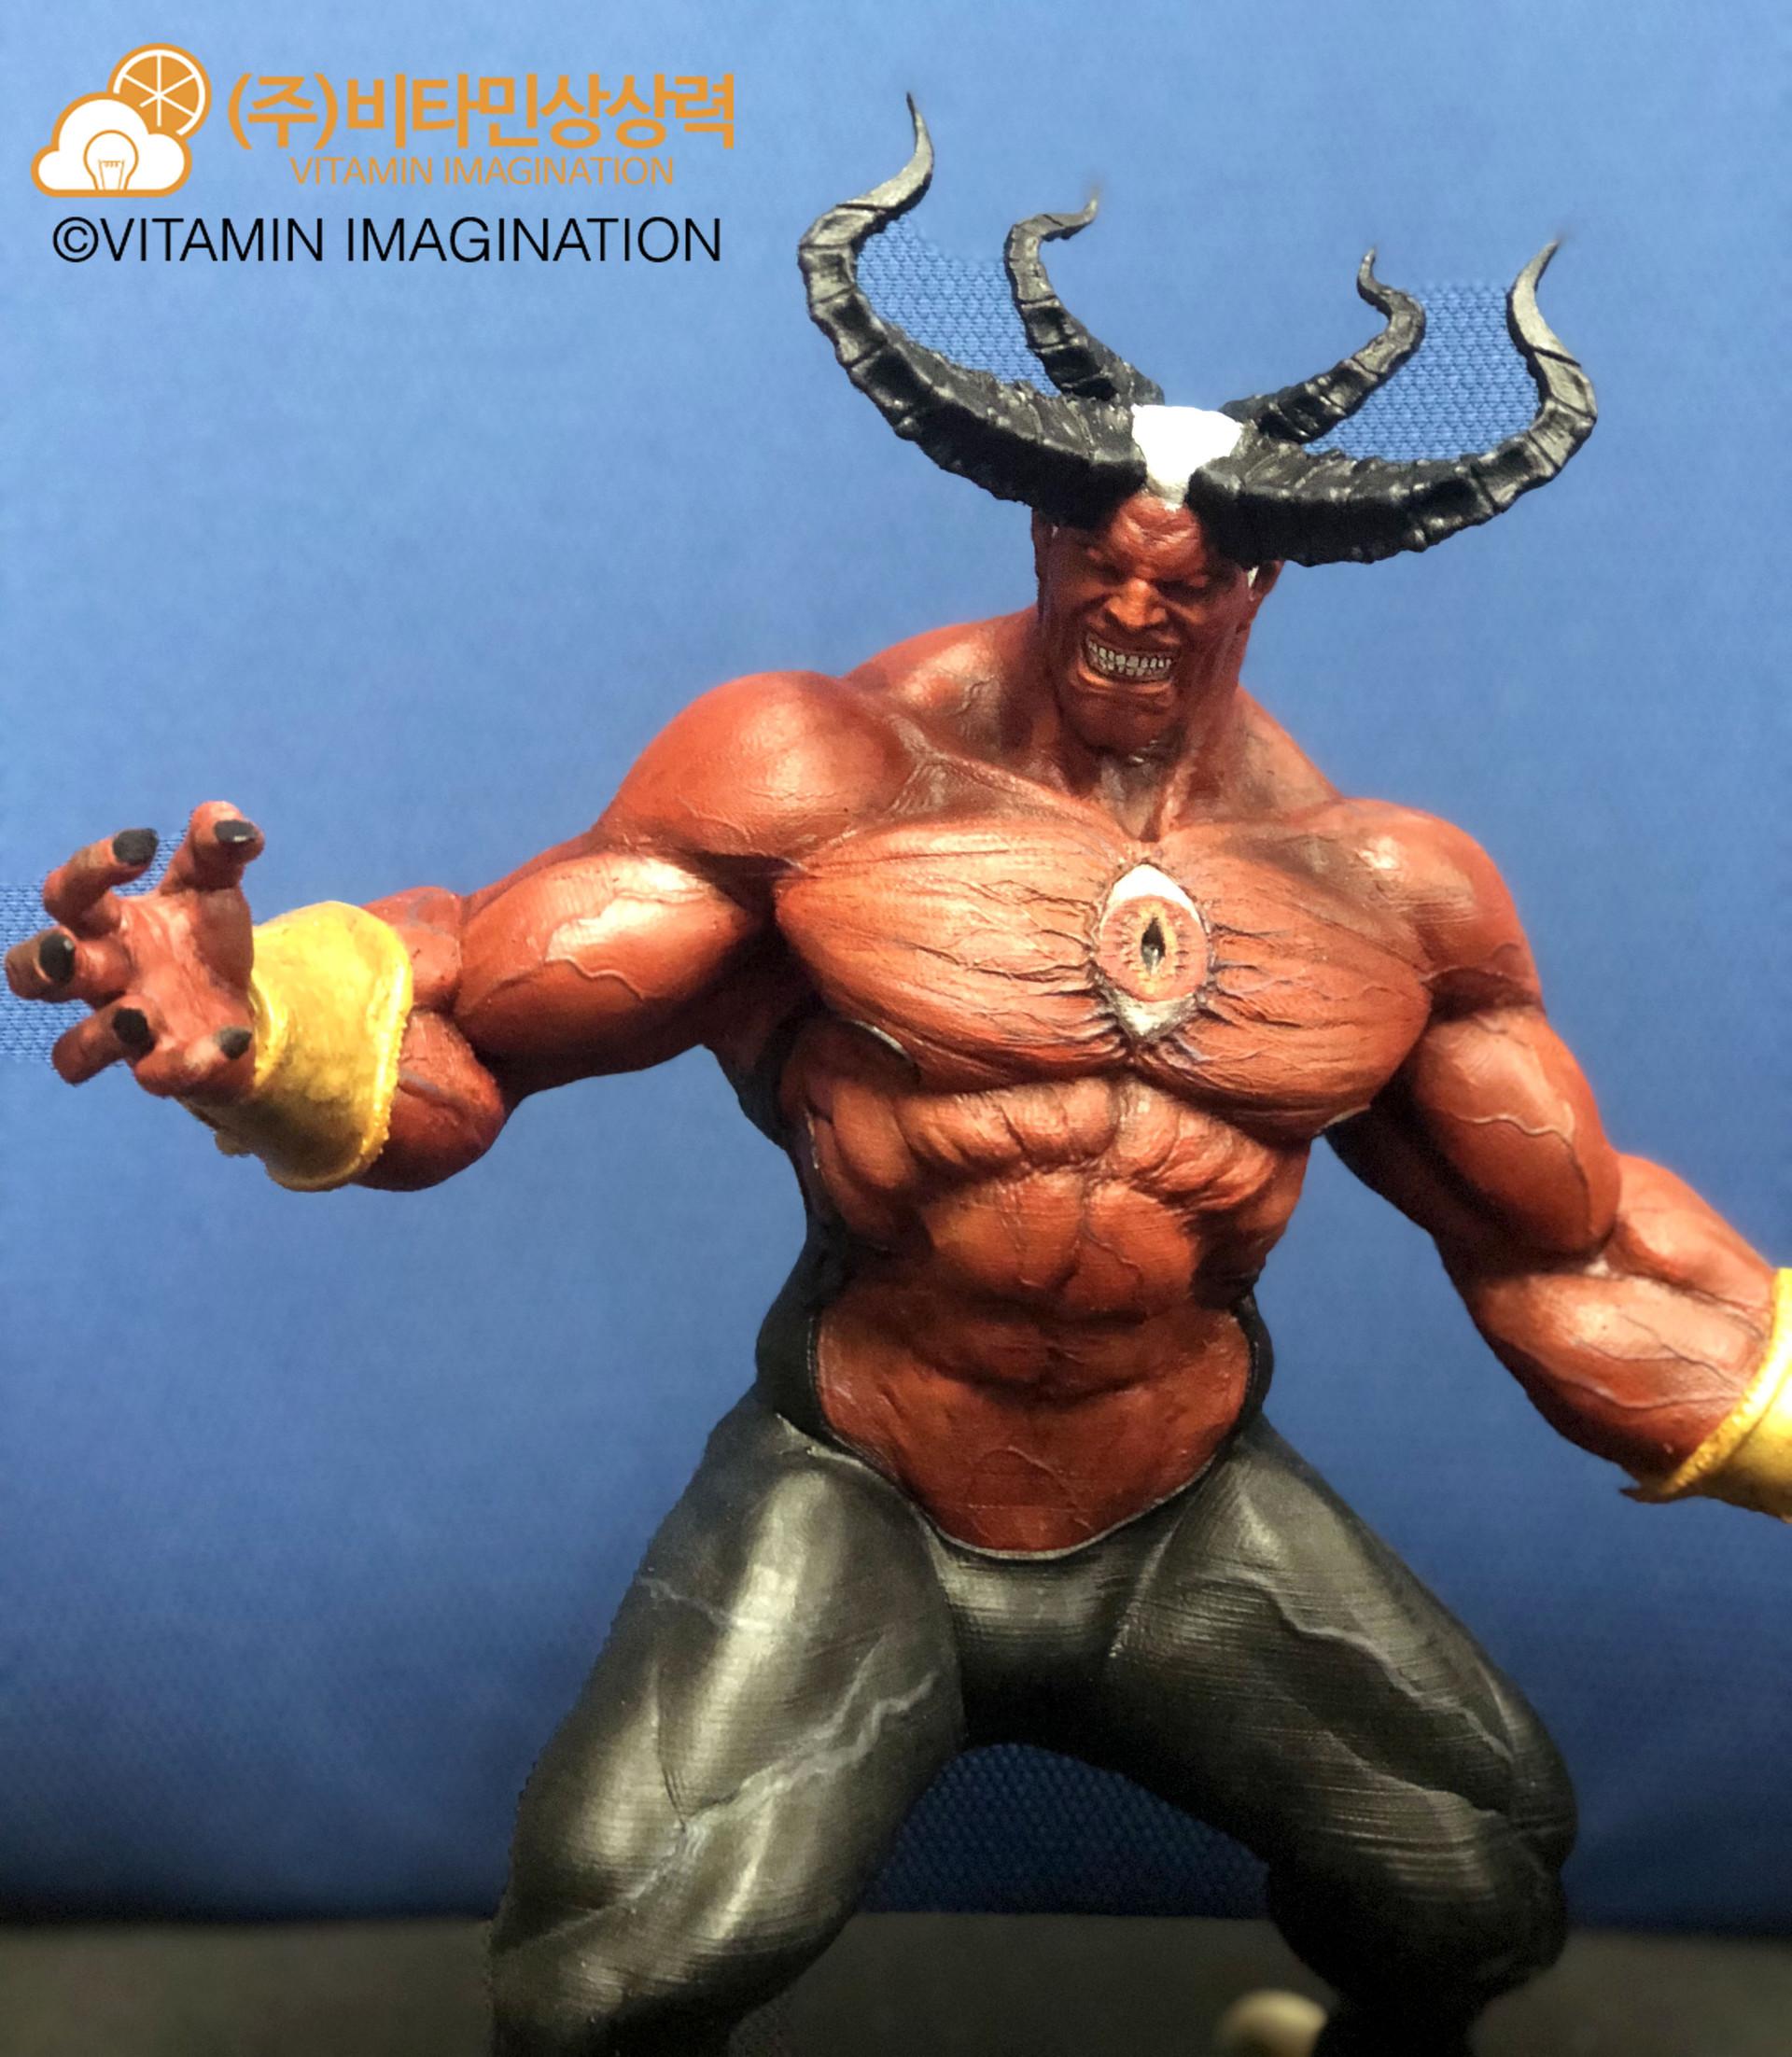 Vitamin imagination 73